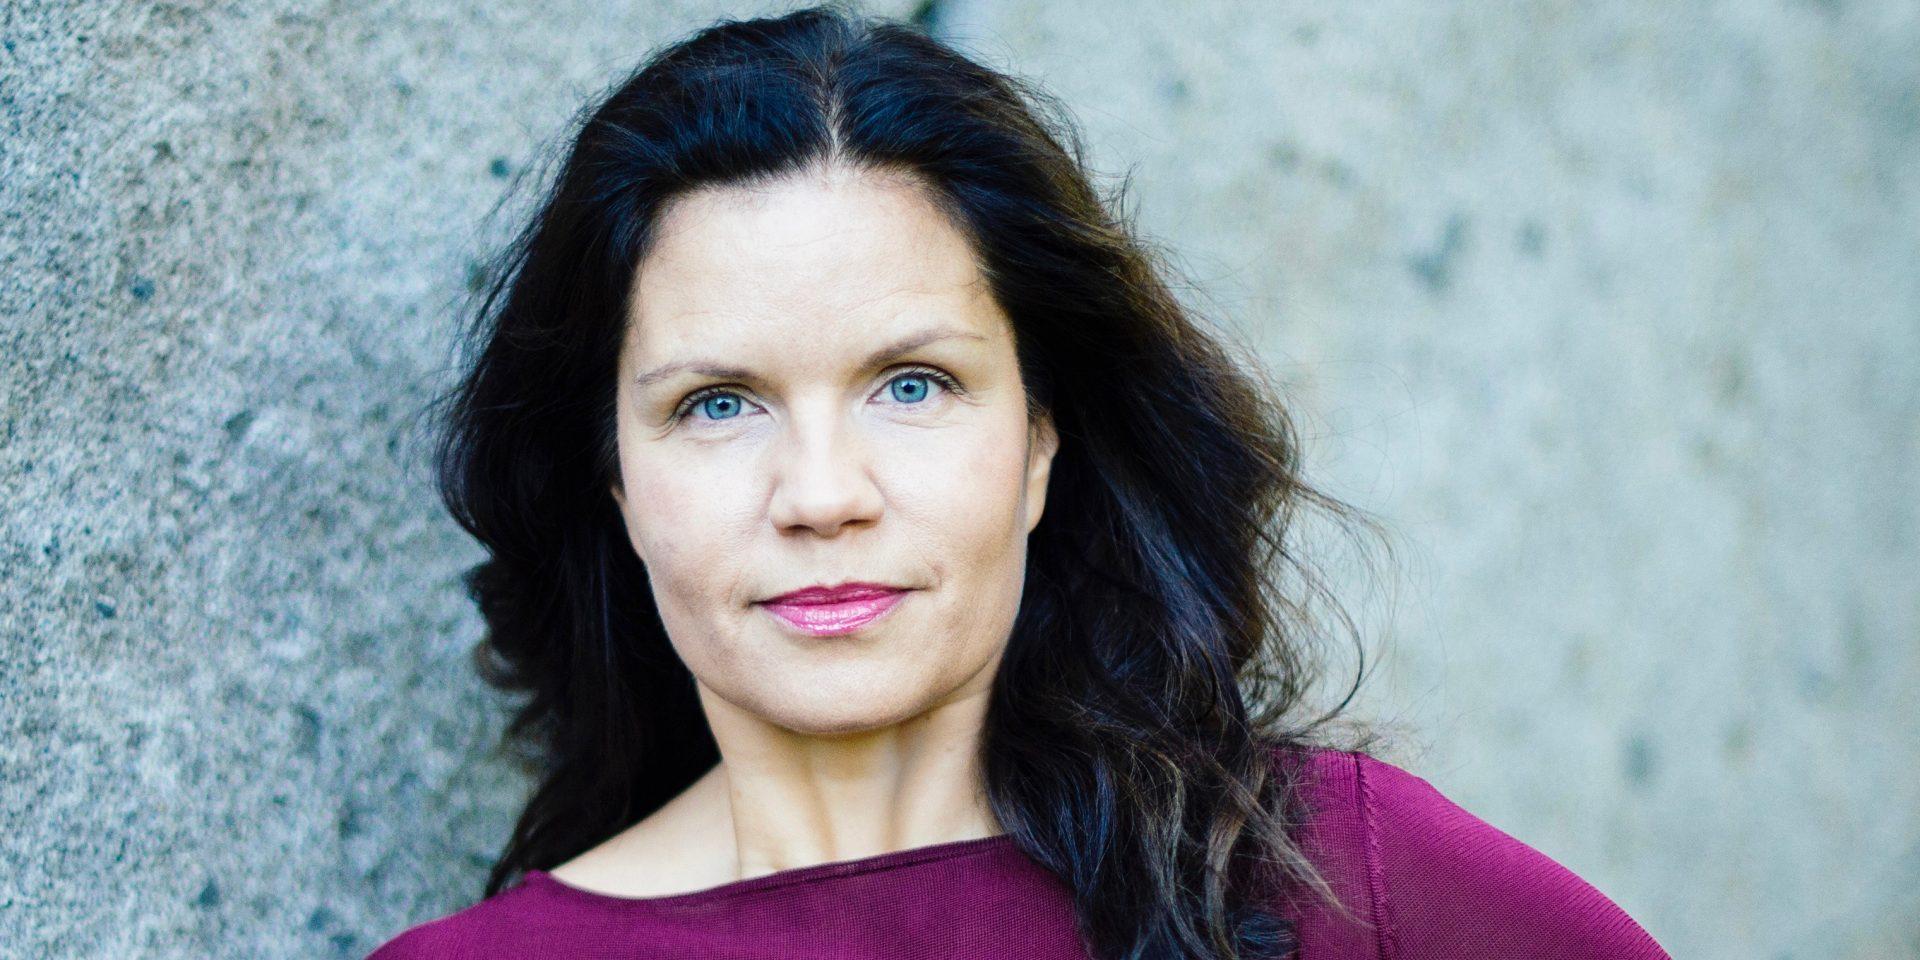 Louise Lindfors är Afrikagruppernas nya generalsekreterare.